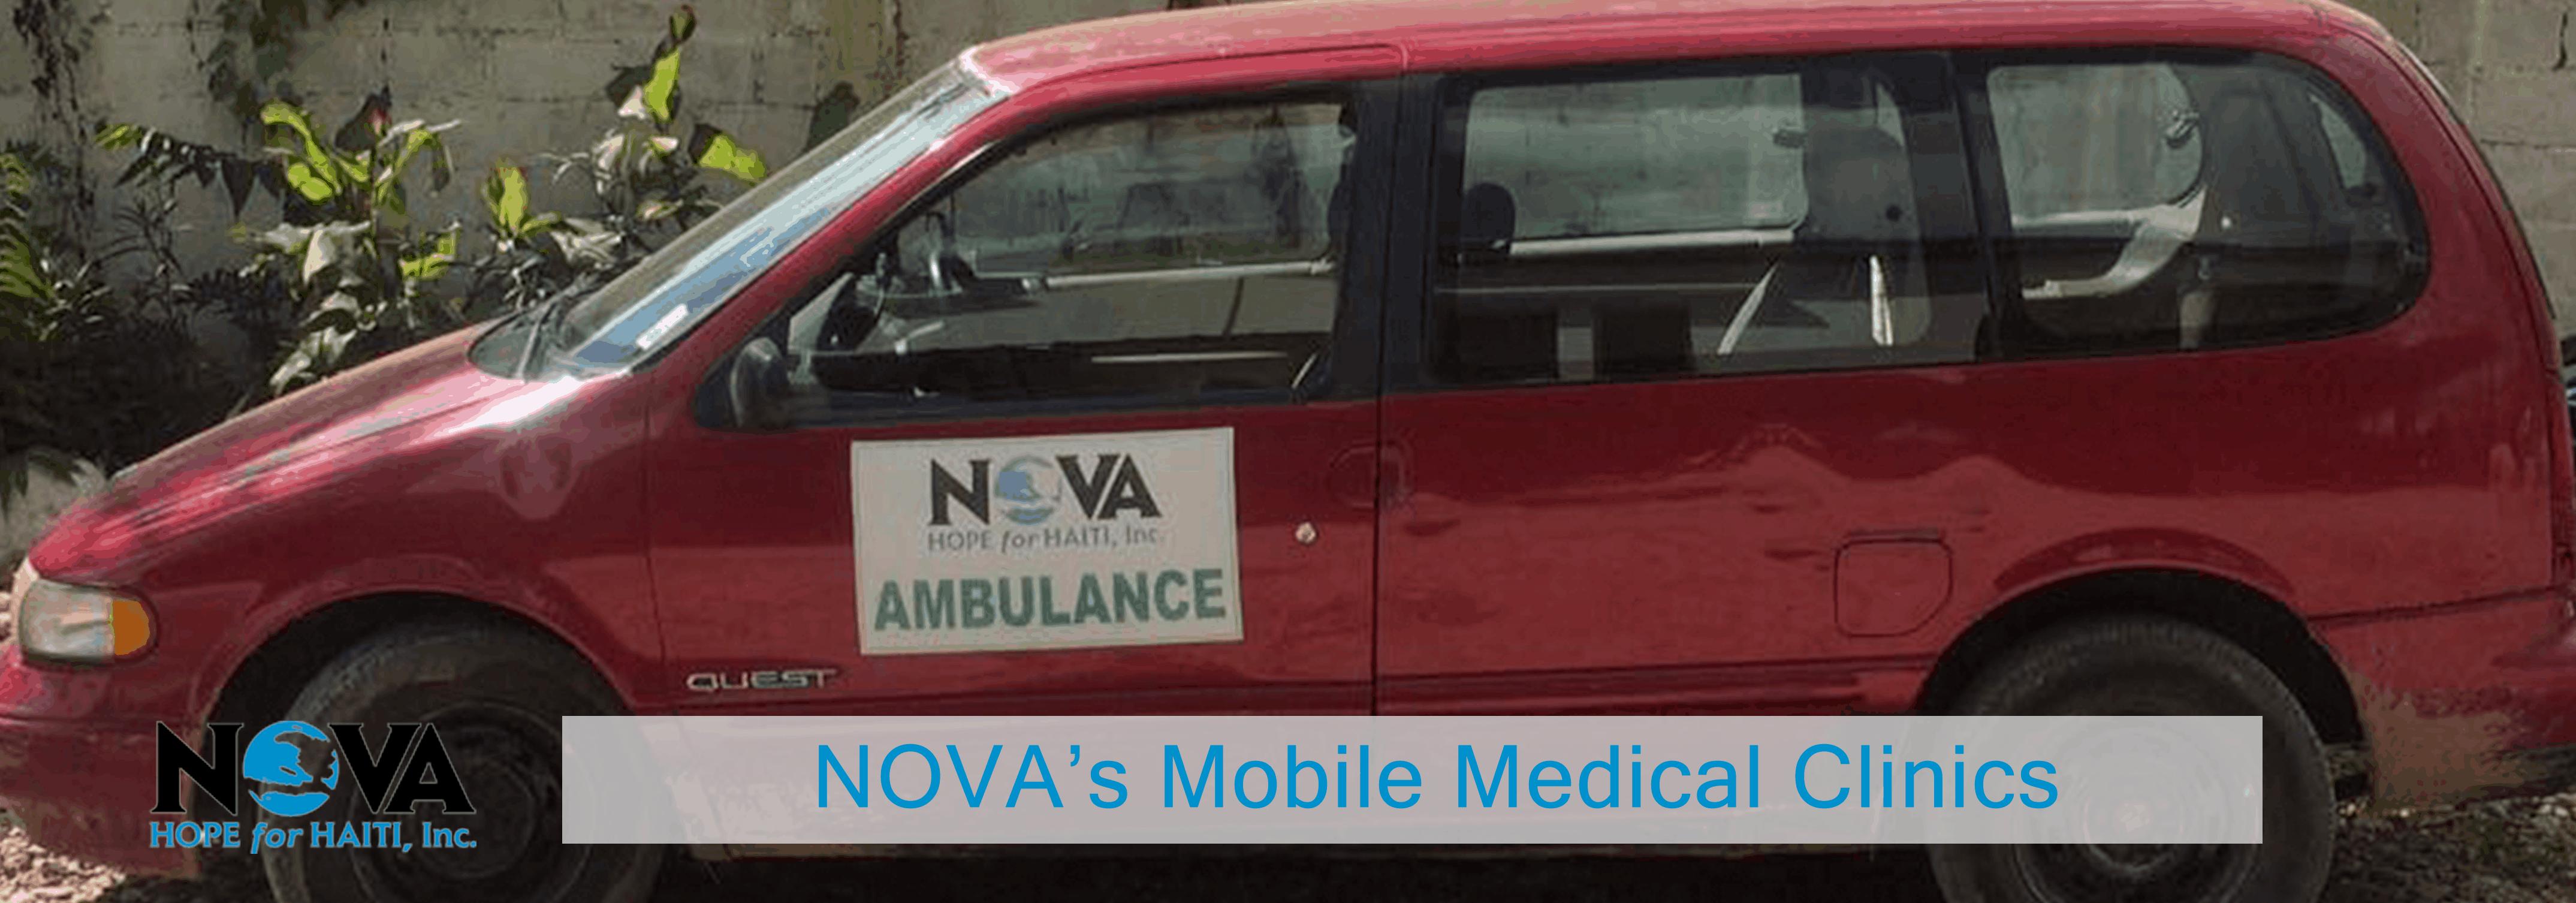 NOVA's Mobile Medical Clinics